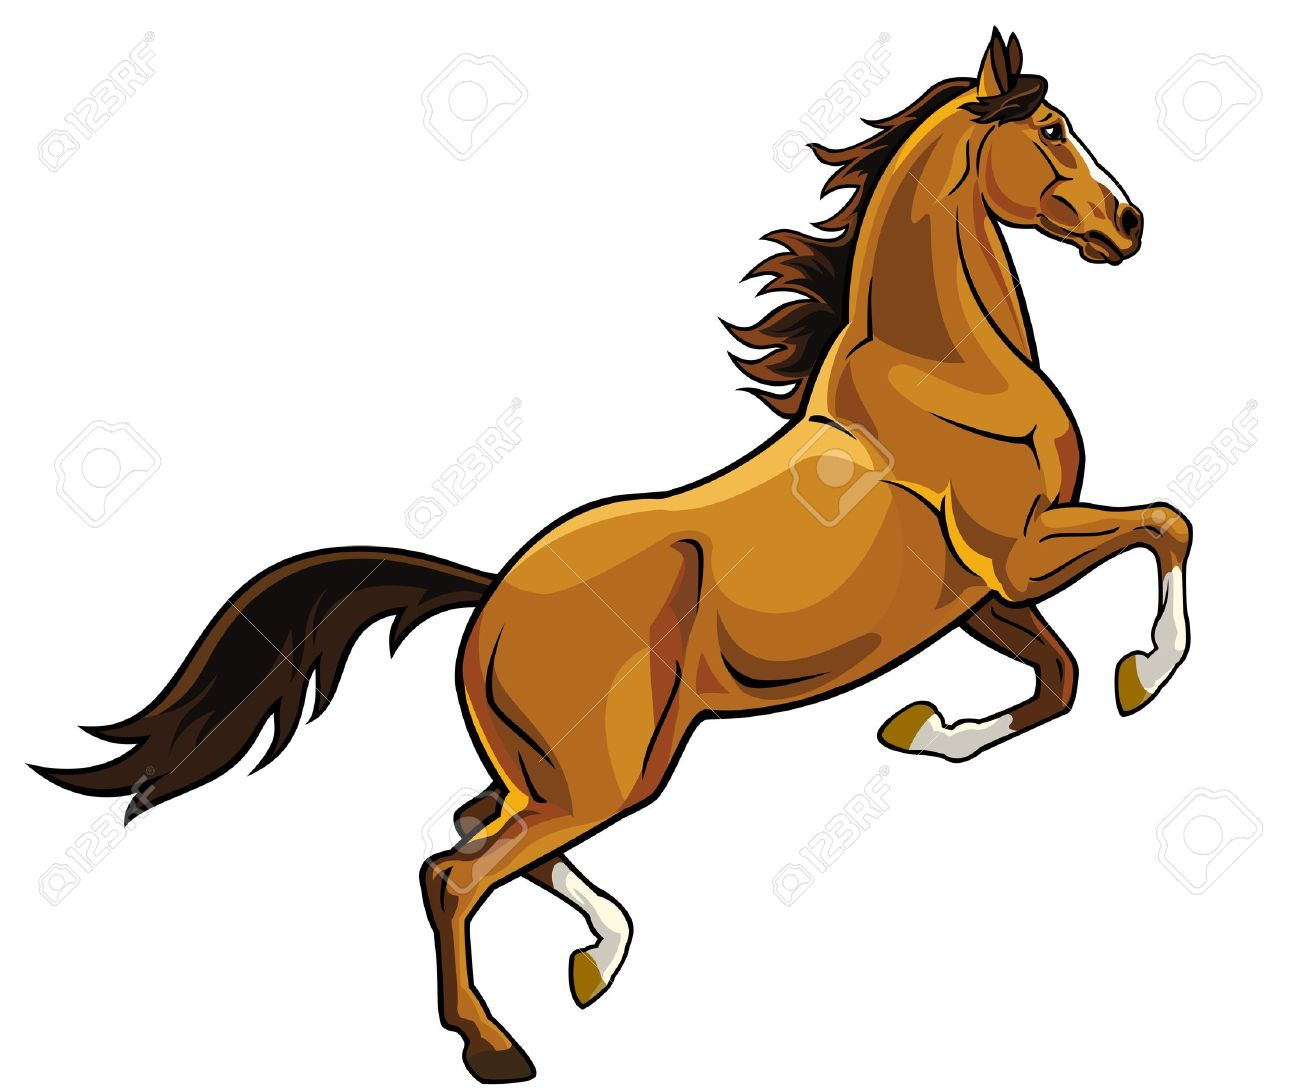 horse rearing image isolated on white background brown stallion rh 123rf com Arabian Stallion Wild Stallions